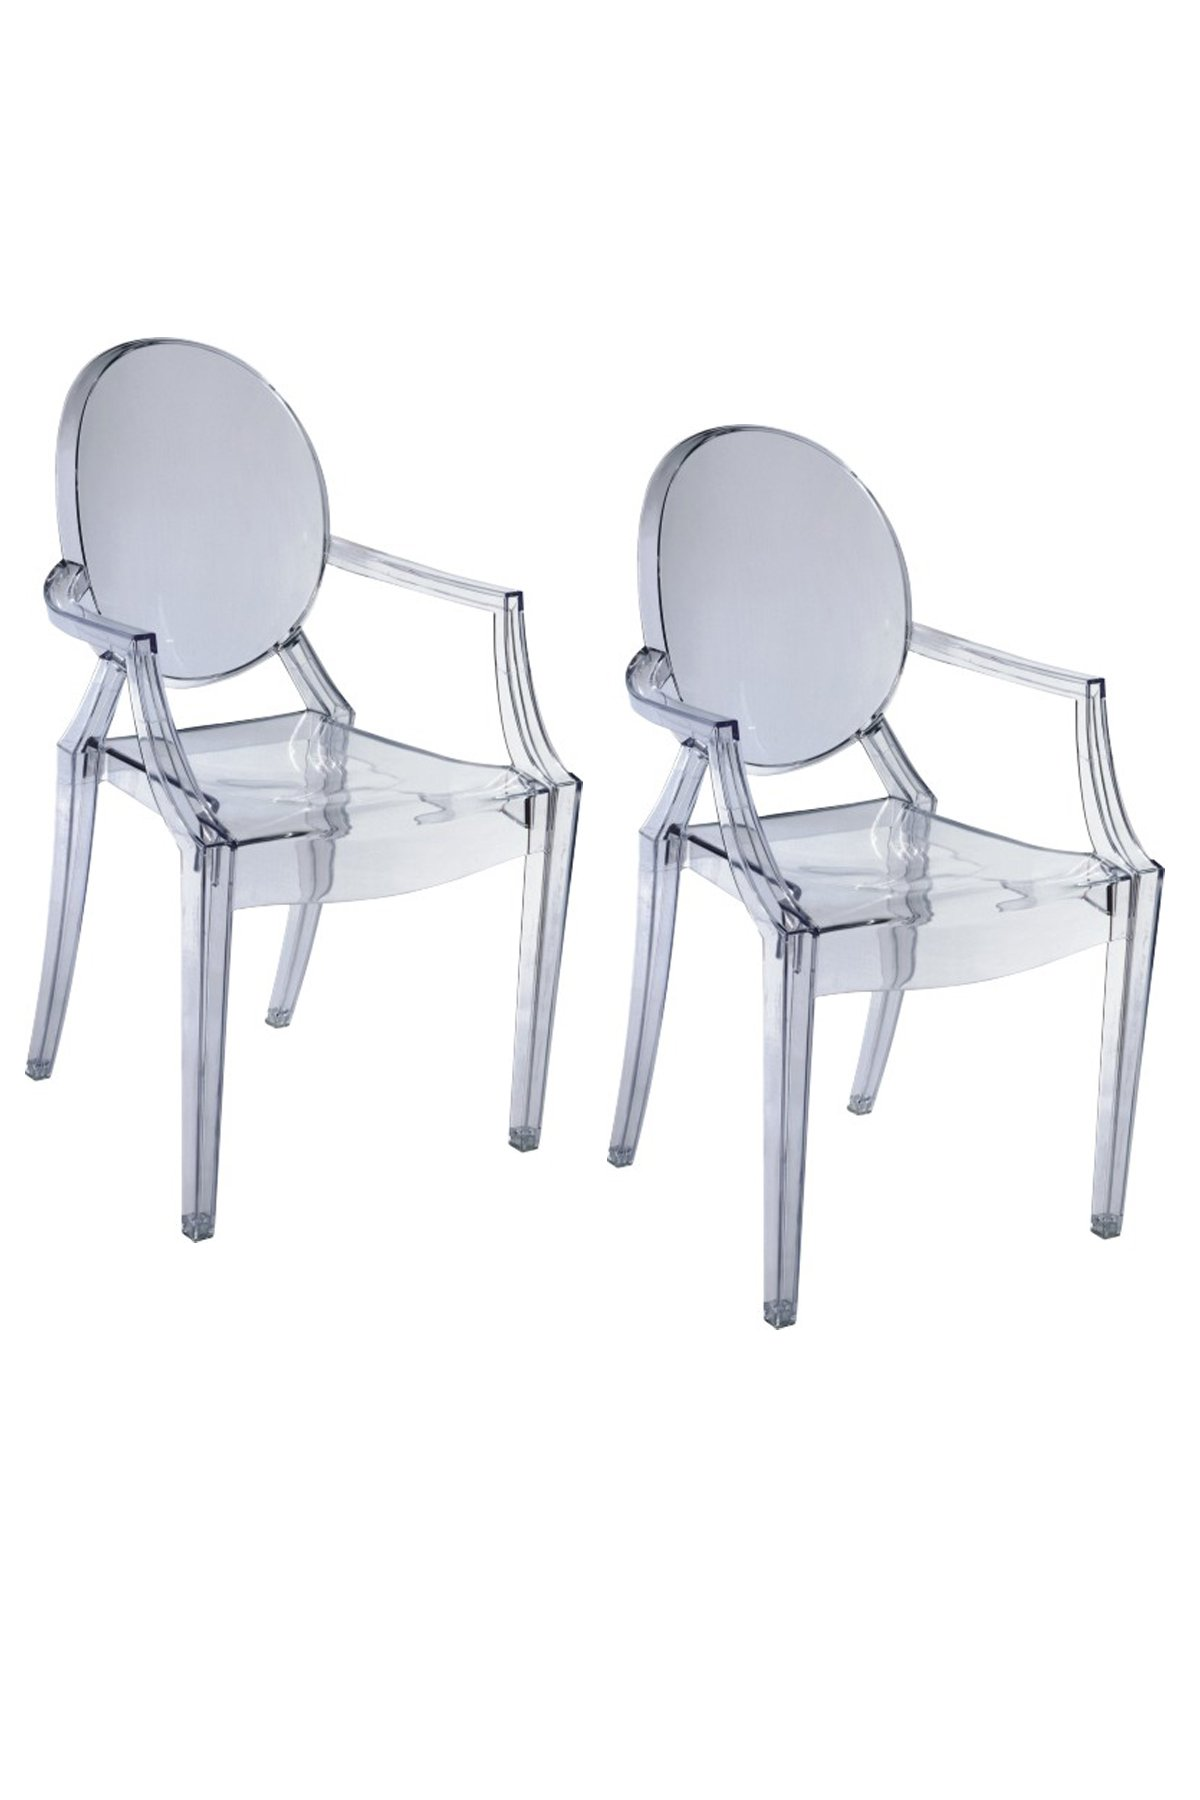 Pangea Home Children Bugatti Dining Chair, Clear, Set of 2